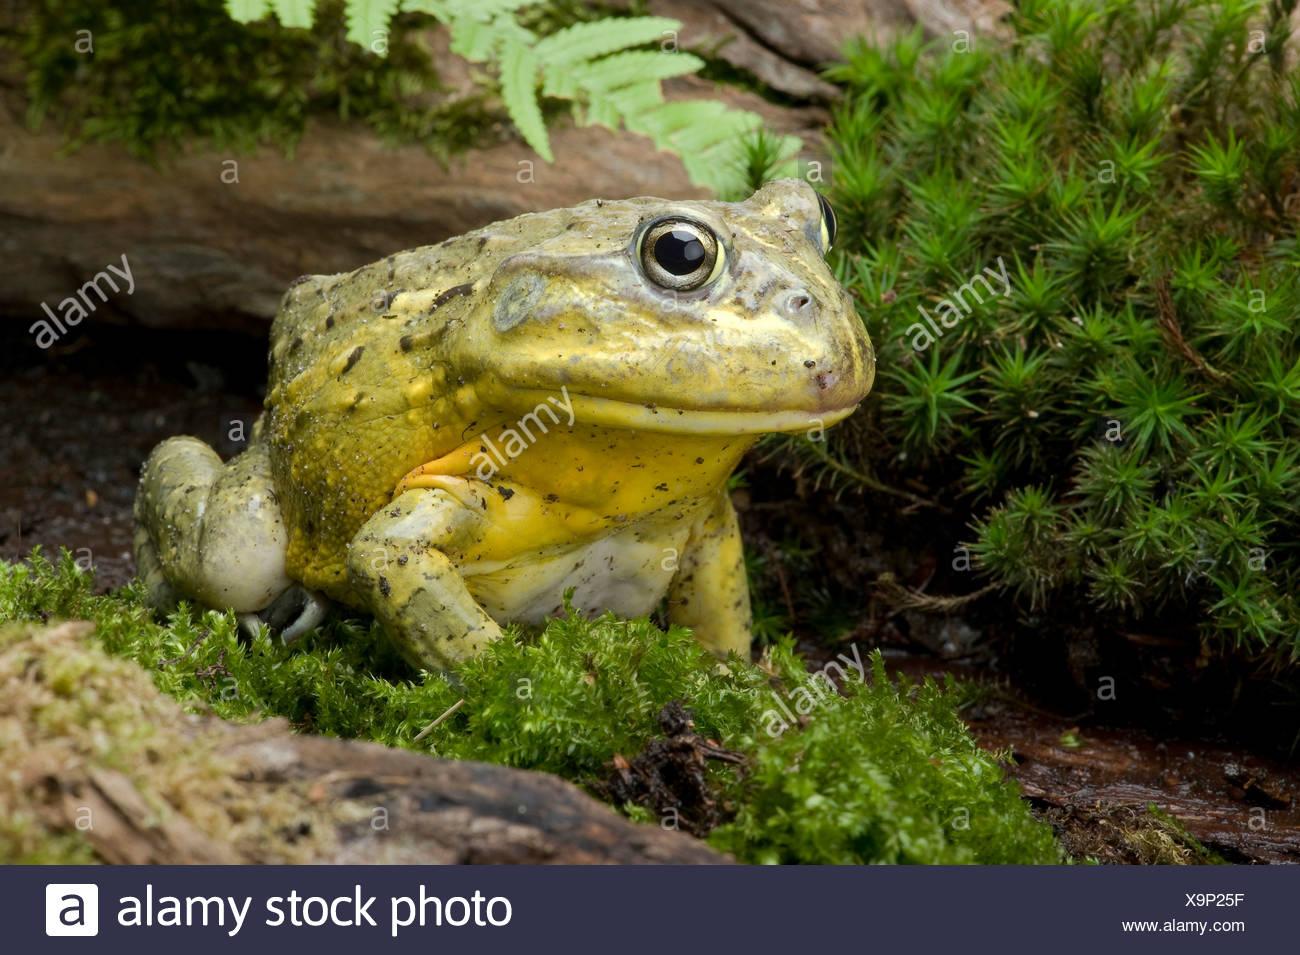 Tschudi's African bullfrog, Gaint bull frog, African Bullfrog (Pyxicephalus adspersus, Afrikanischer Grabfrosch), on moss - Stock Image